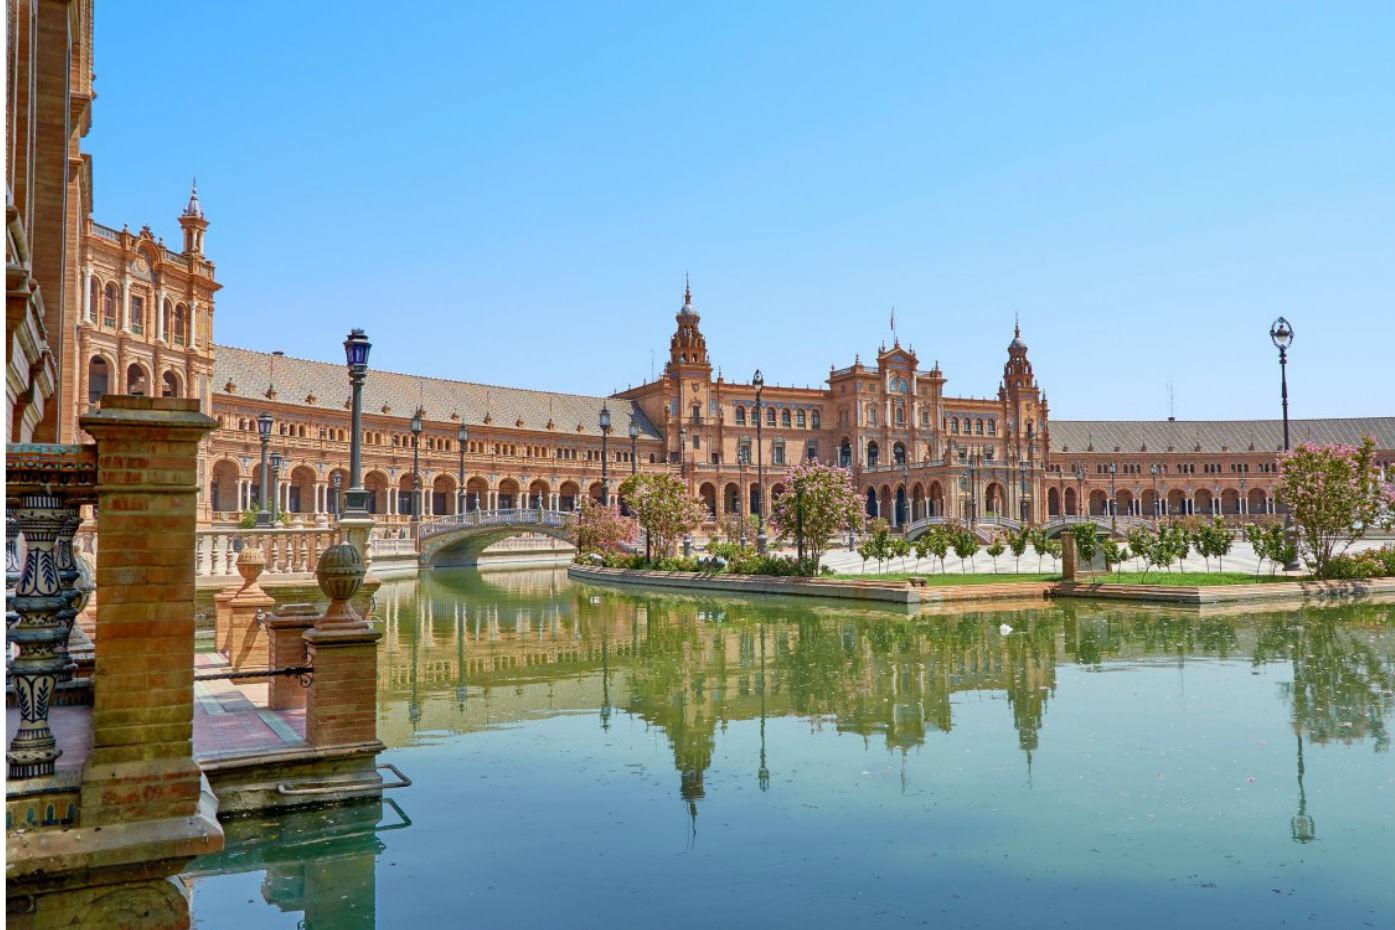 8 Europese steden met het lekkerste weer: Sevilla